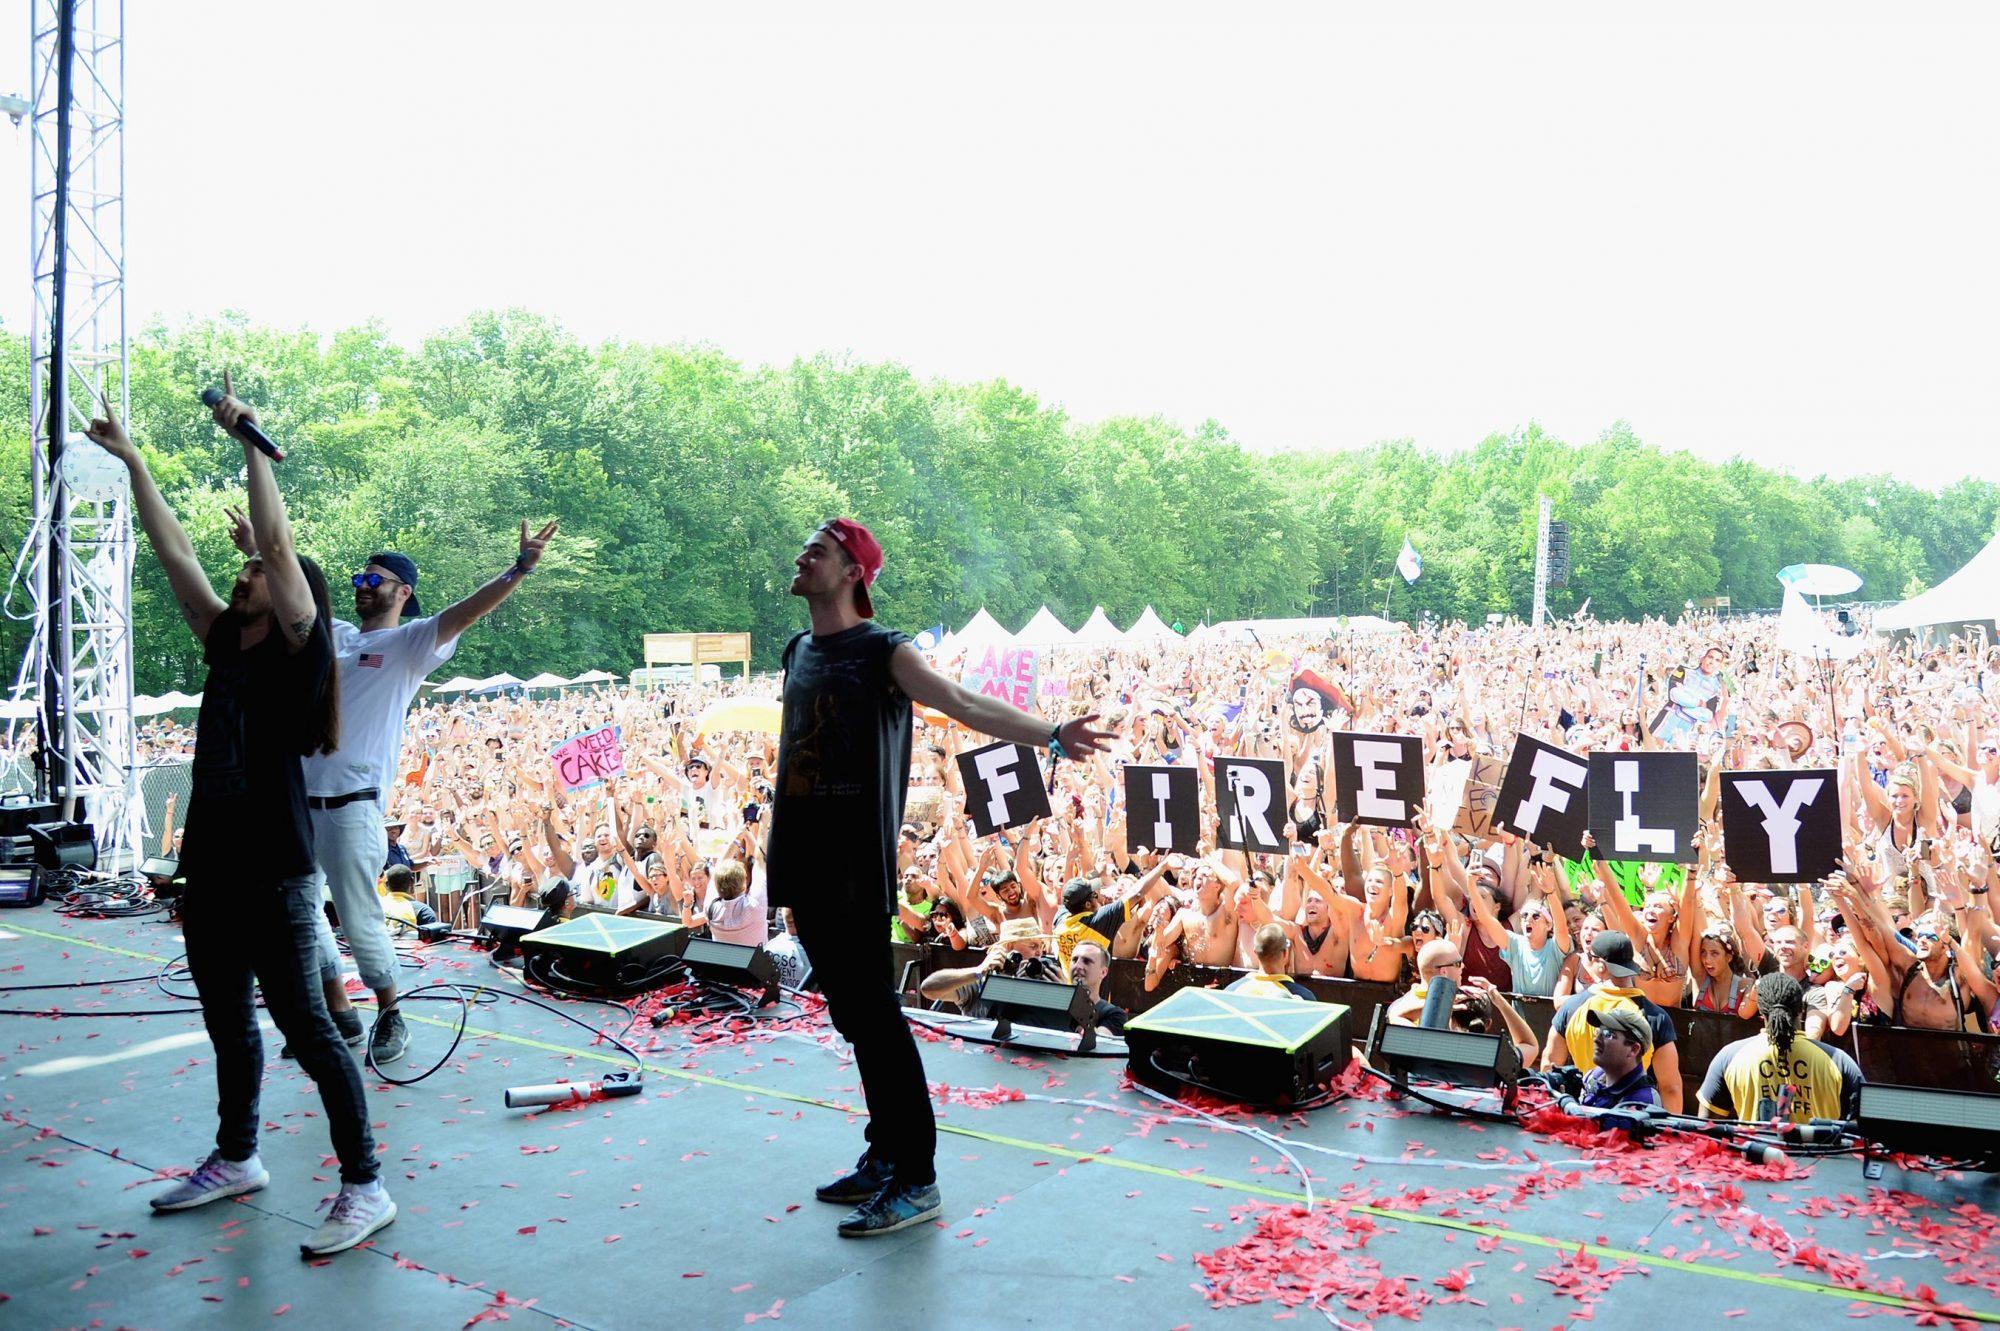 Firefly Music Festival 2015 - Day 4